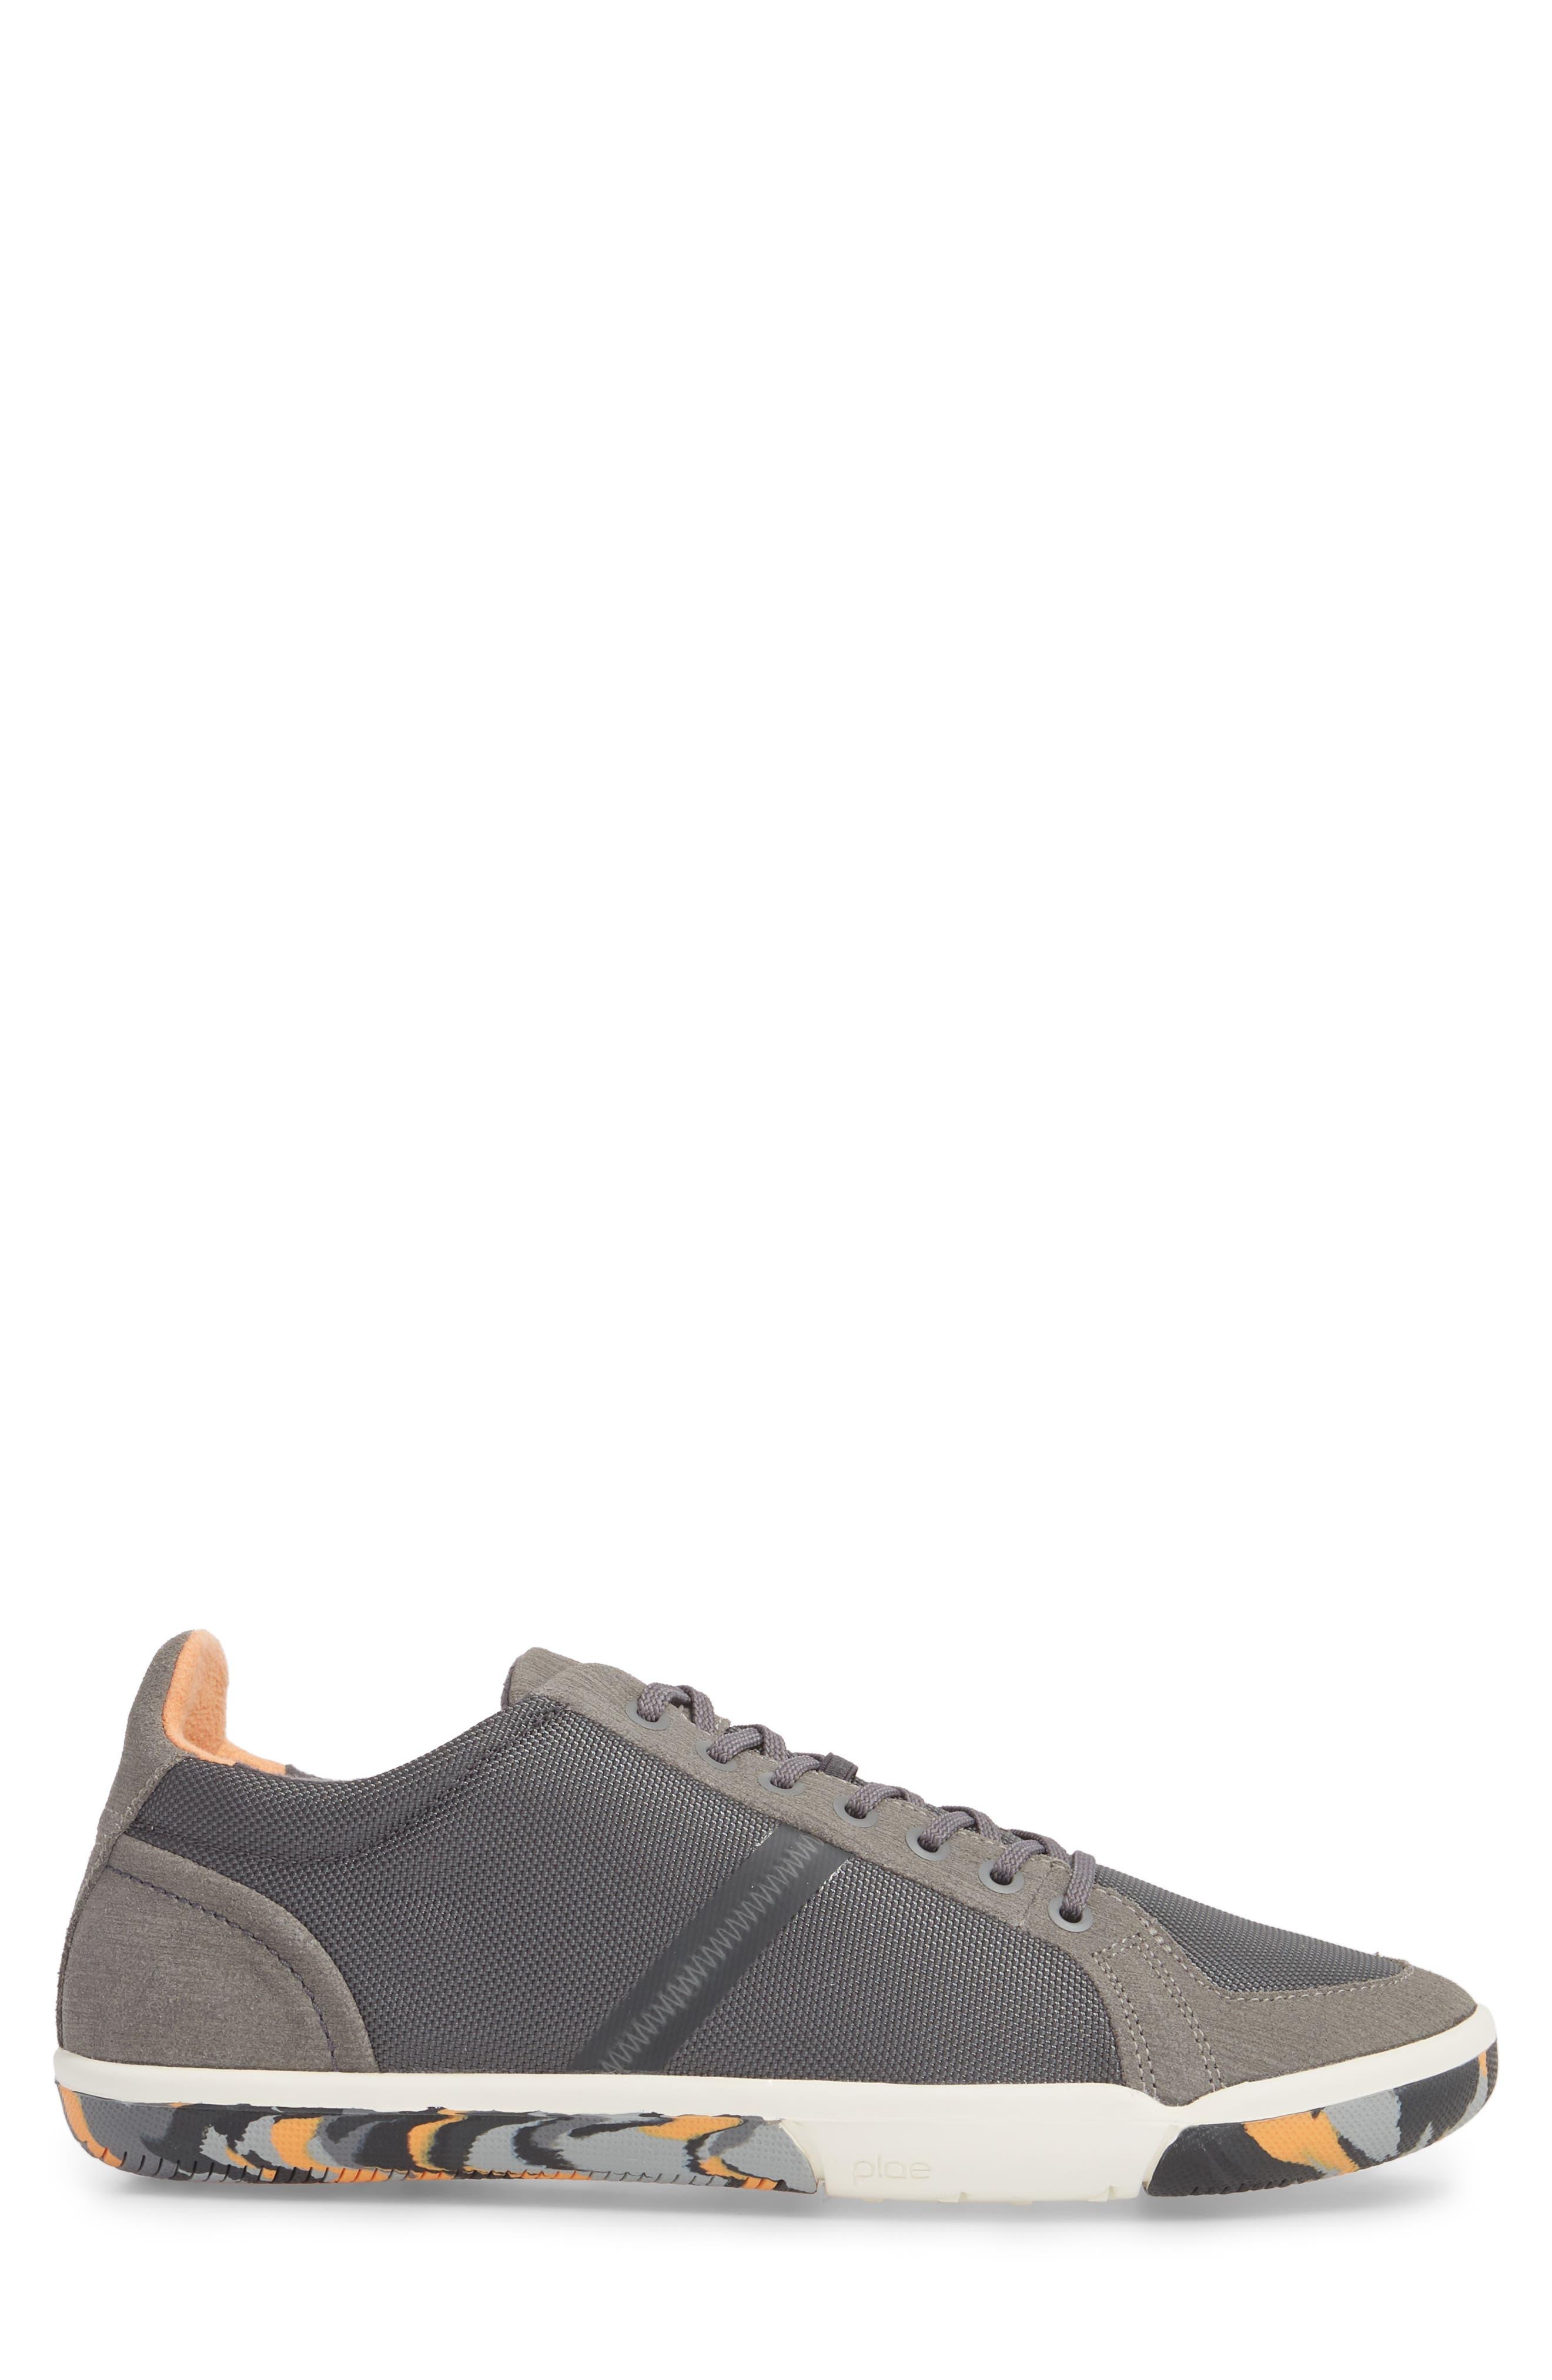 Prospect Low Top Sneaker,                             Alternate thumbnail 3, color,                             070